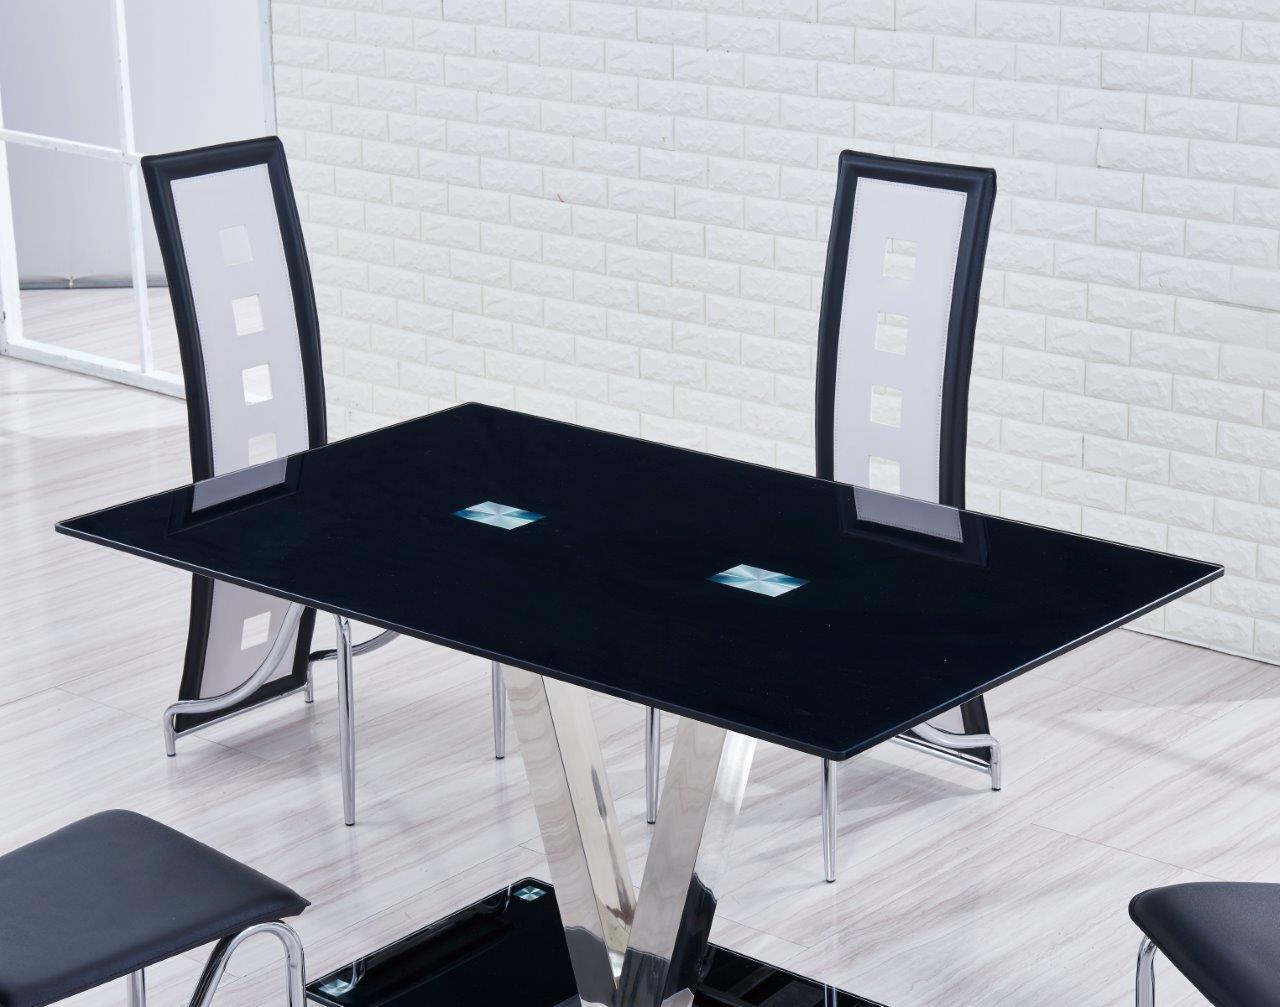 appliances usa dining global sets room furniture